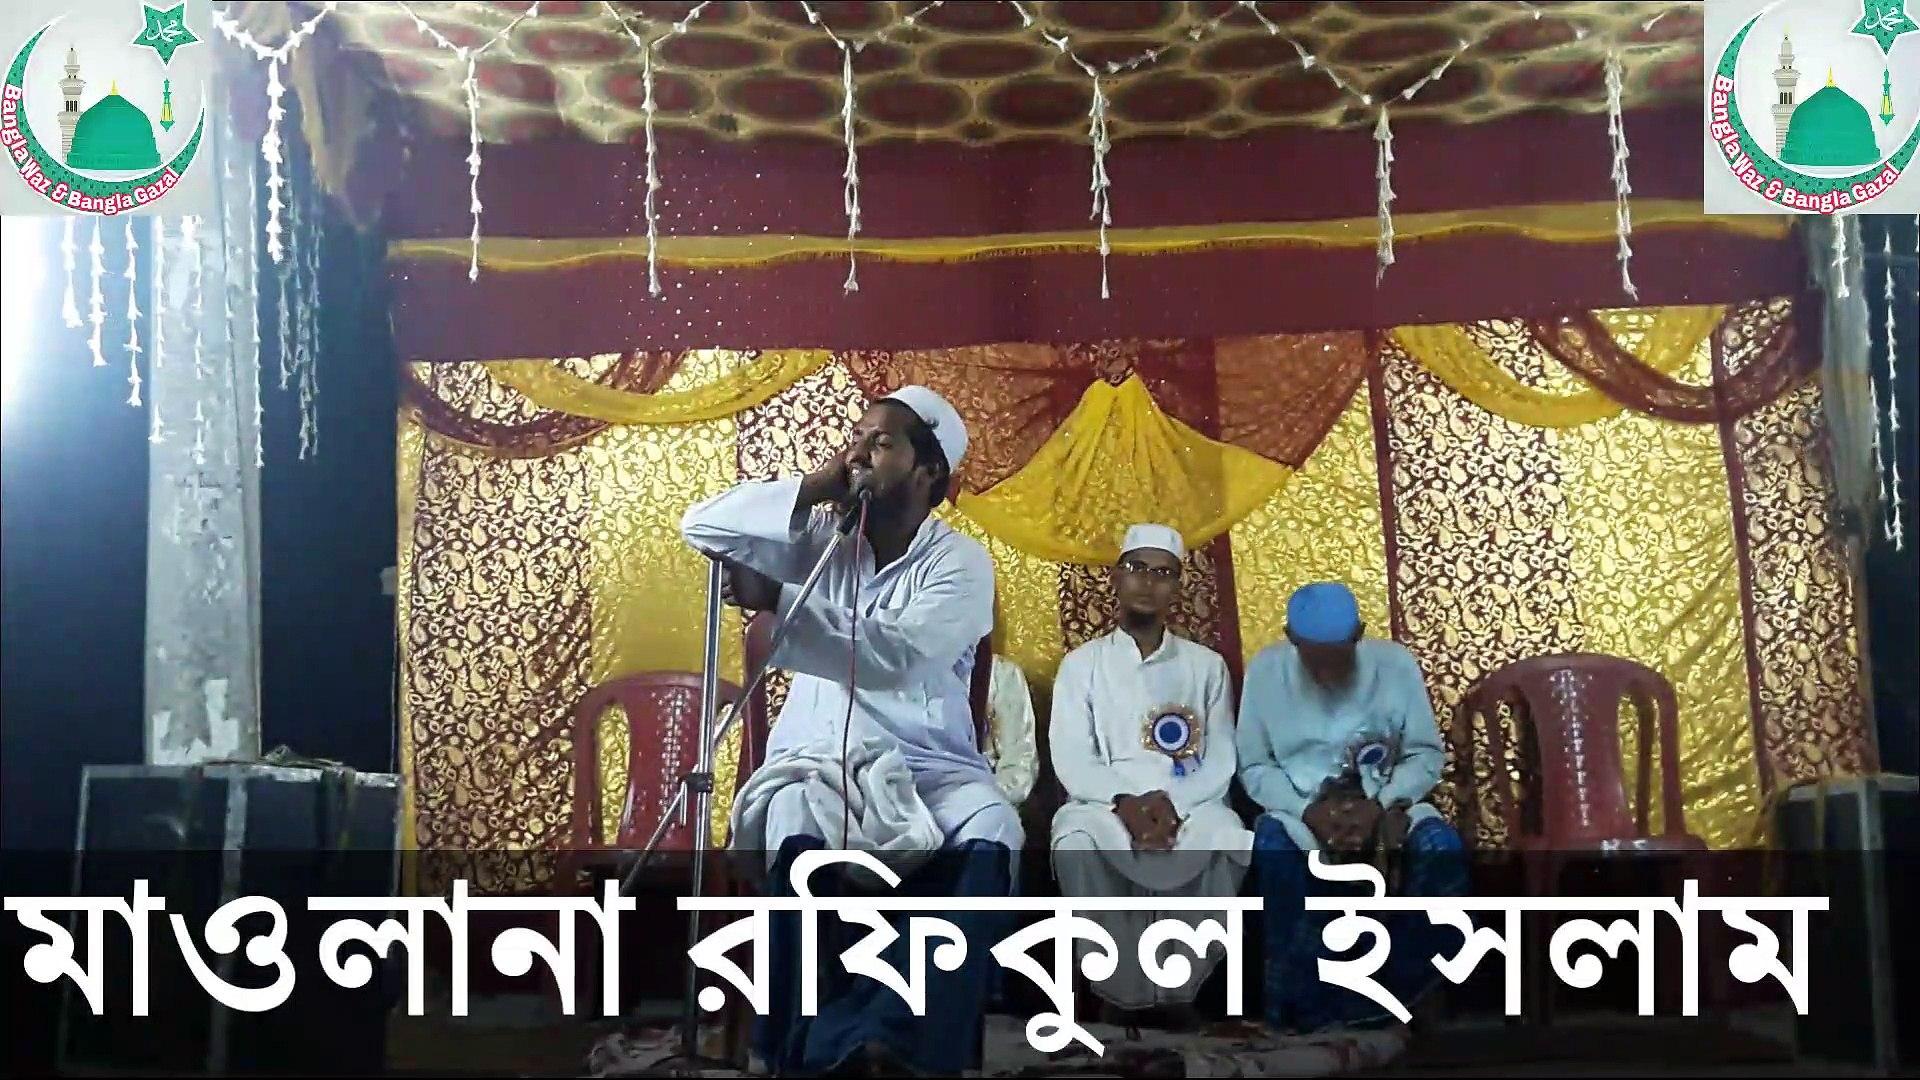 New Bangla Waz Rafiqul Islam | নুতন বাংলা ওয়াজ রফিকুল ইসলাম || Part - 3